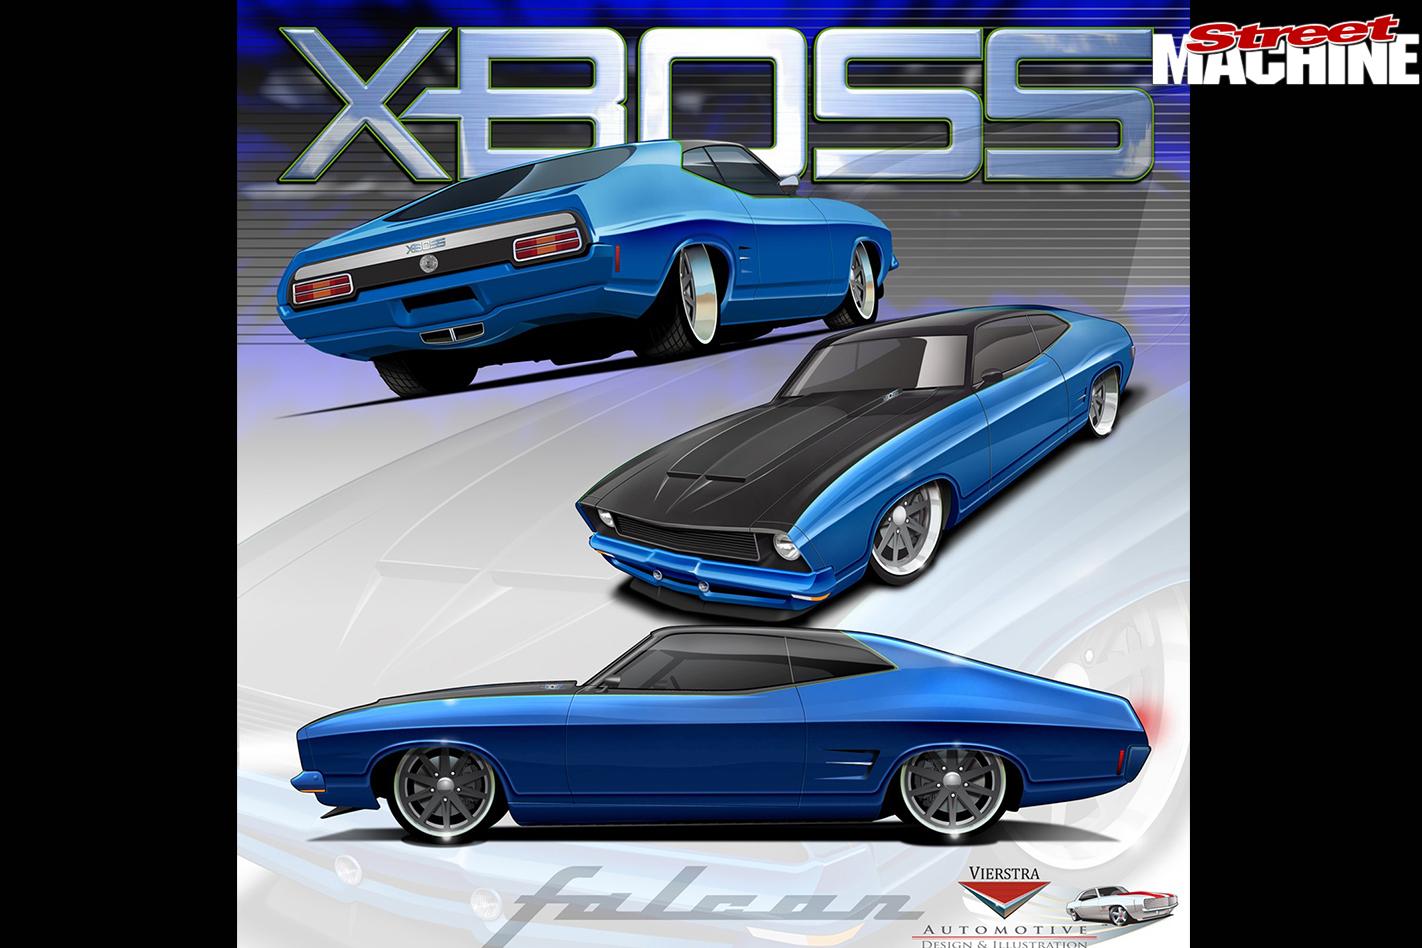 XBOSS-Falcon -00